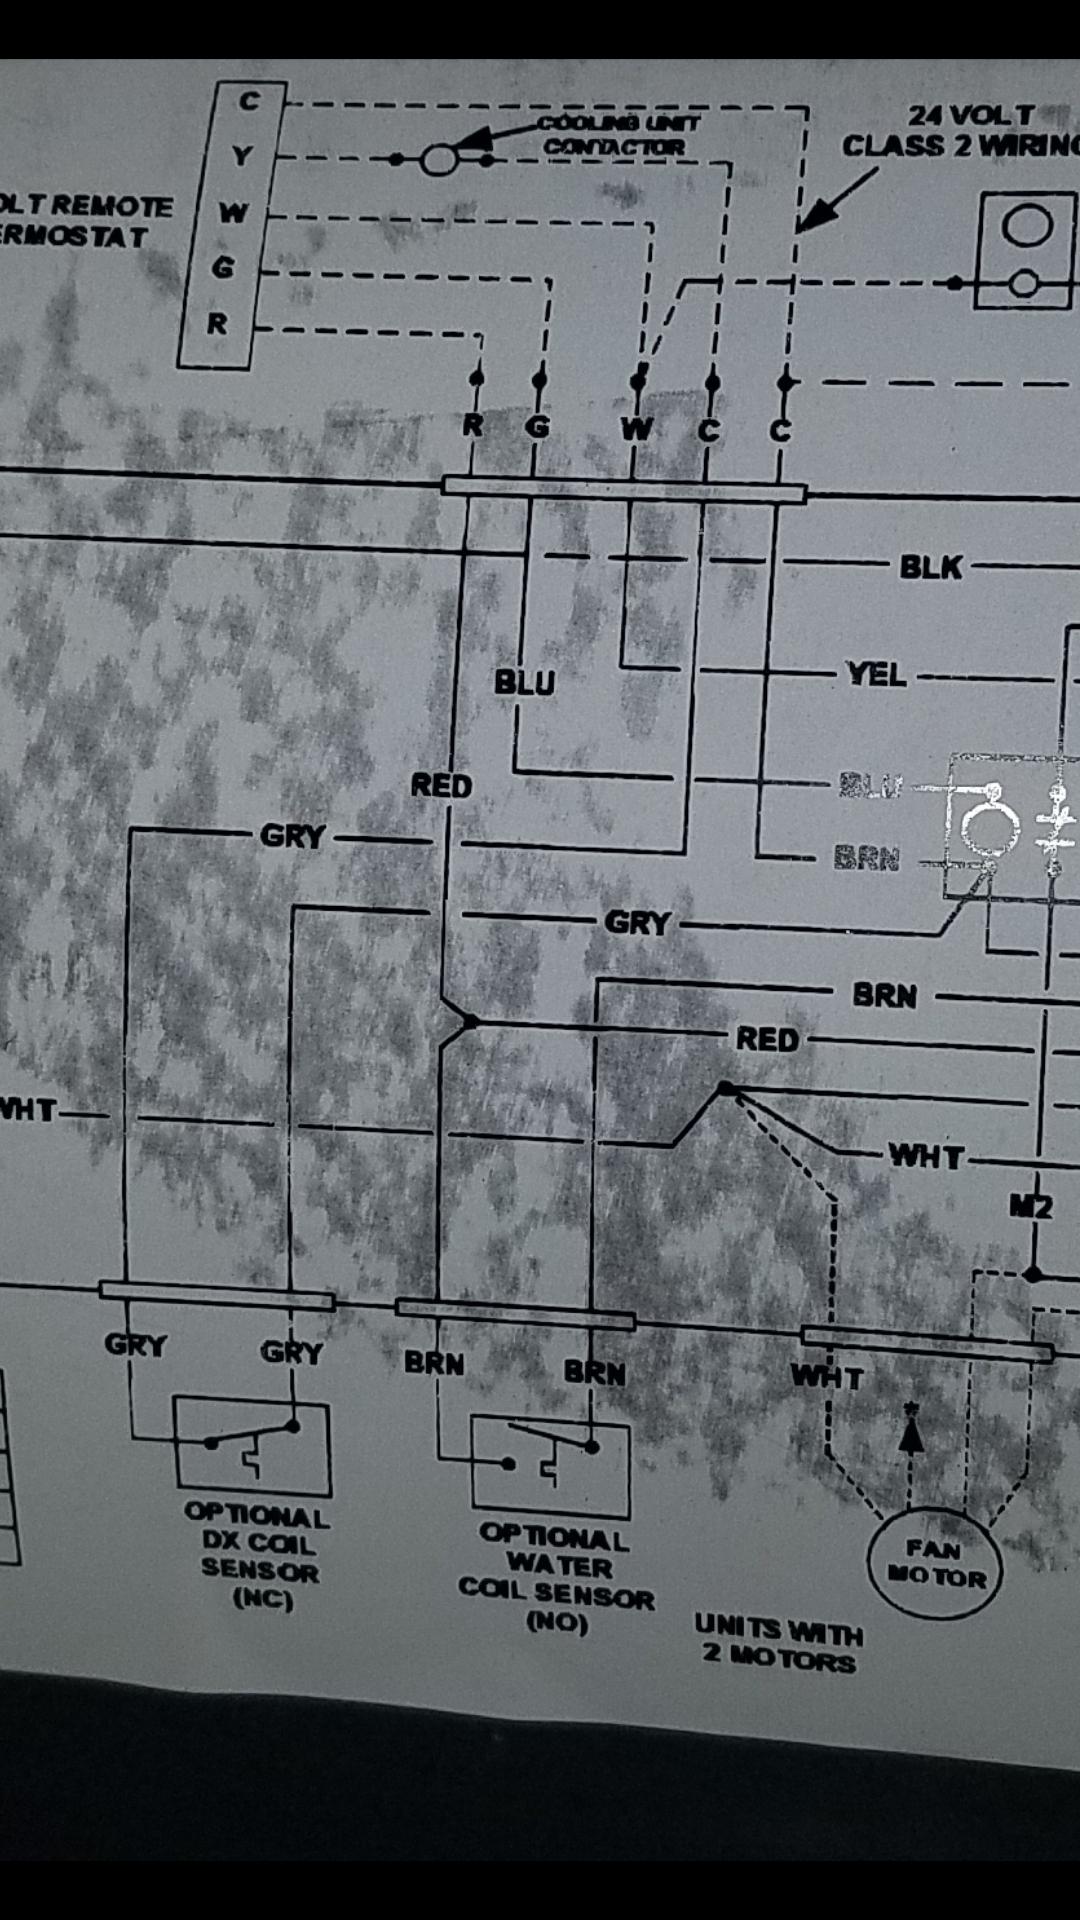 First Co Wiring Standard - Air Handler Wiring Diagram